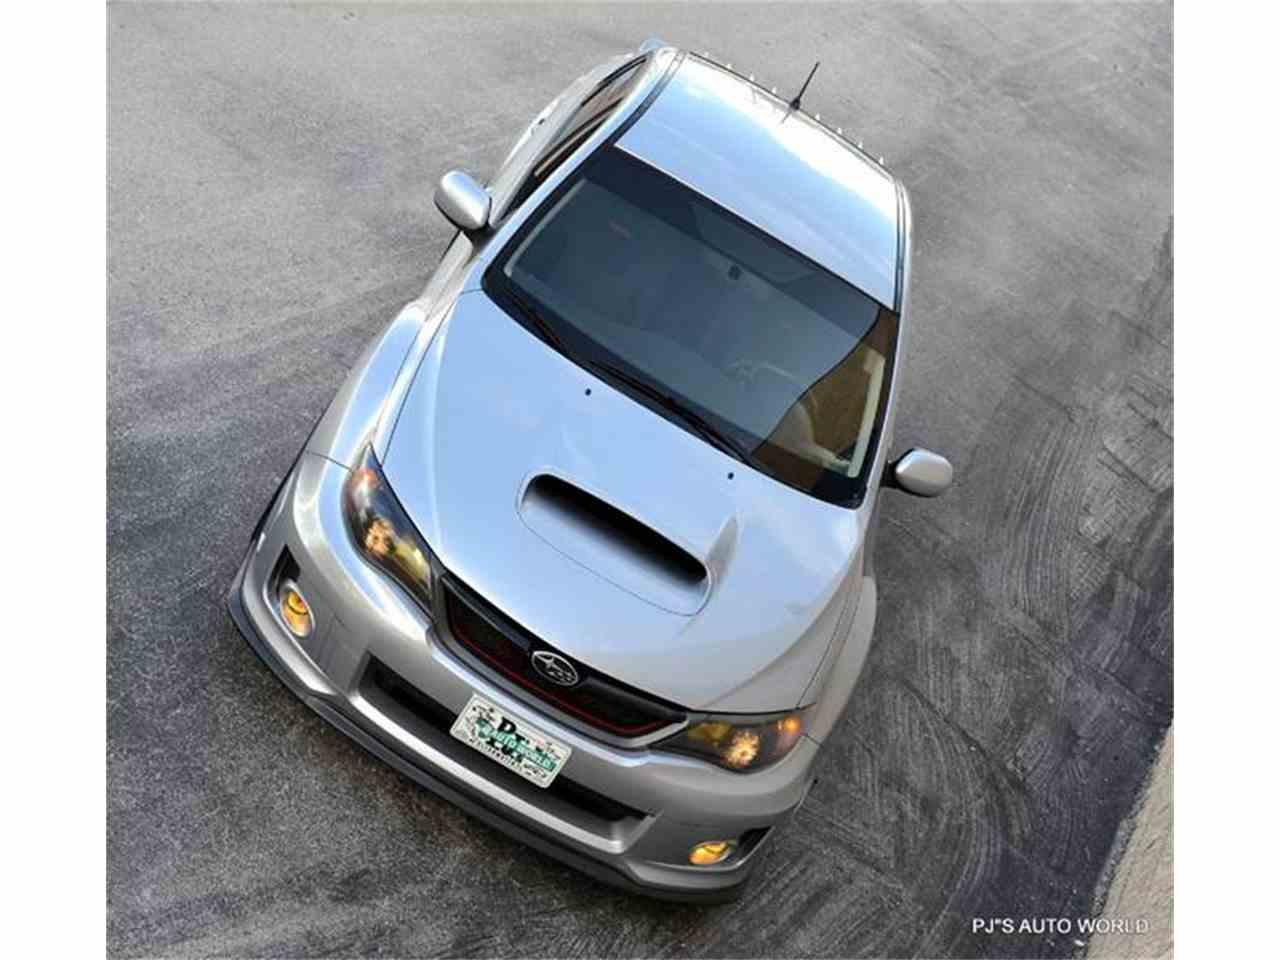 Large Picture of 2013 Subaru Impreza - $19,900.00 Offered by PJ's Auto World - J6WM